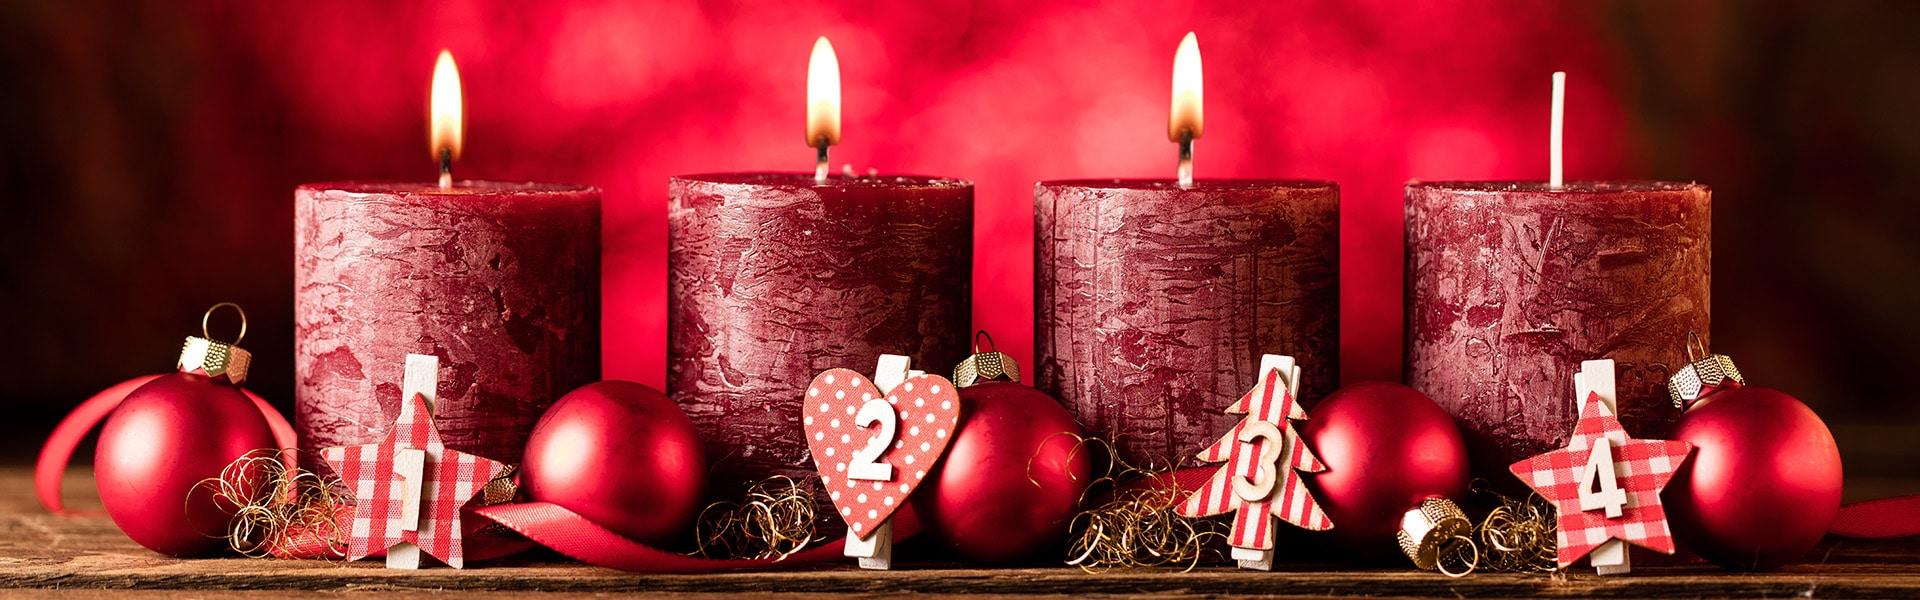 Bild dritter Advent - Fotostudio Keepsmile, Castrop-Rauxel - Fotoshootings und mehr